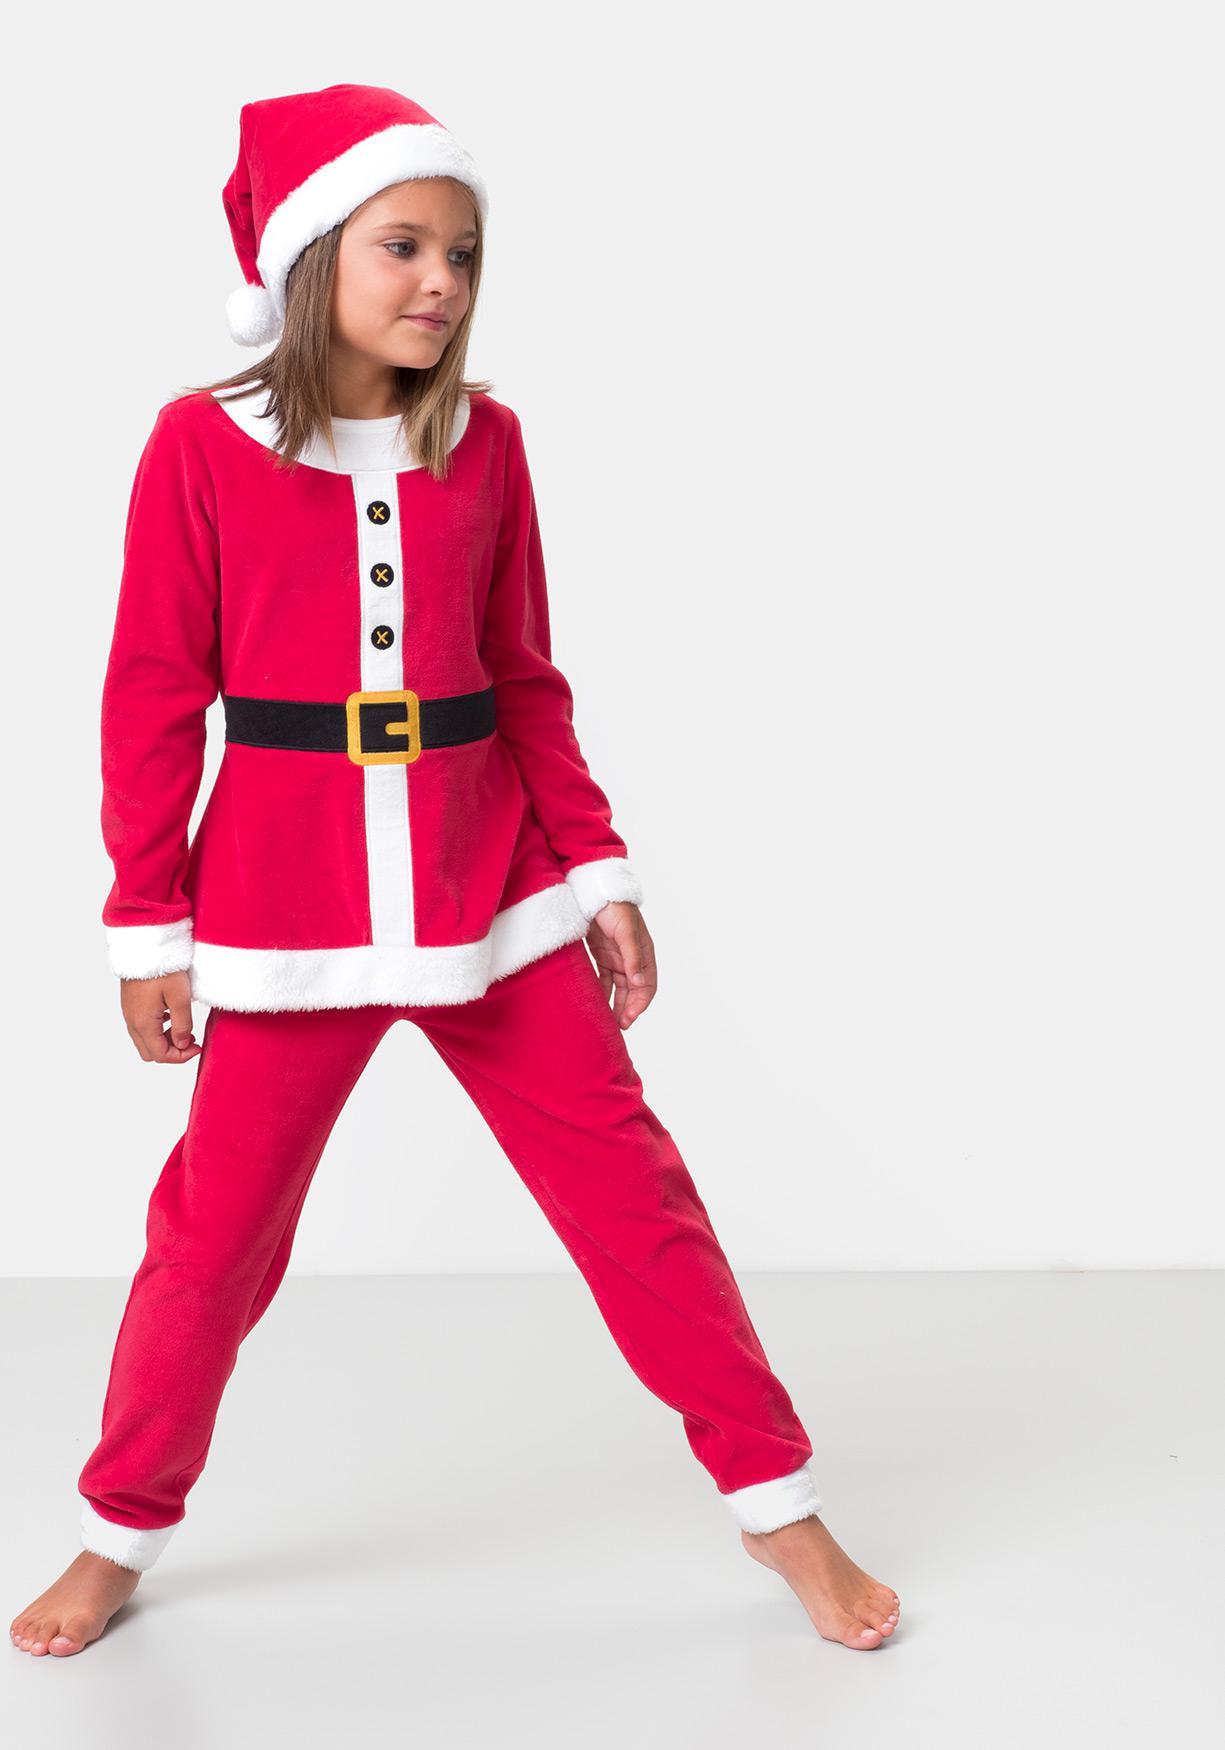 Comprar Pijama de Mamá Noel con gorrito TEX. ¡Aprovéchate de ... 5e8e2c1dfbb5